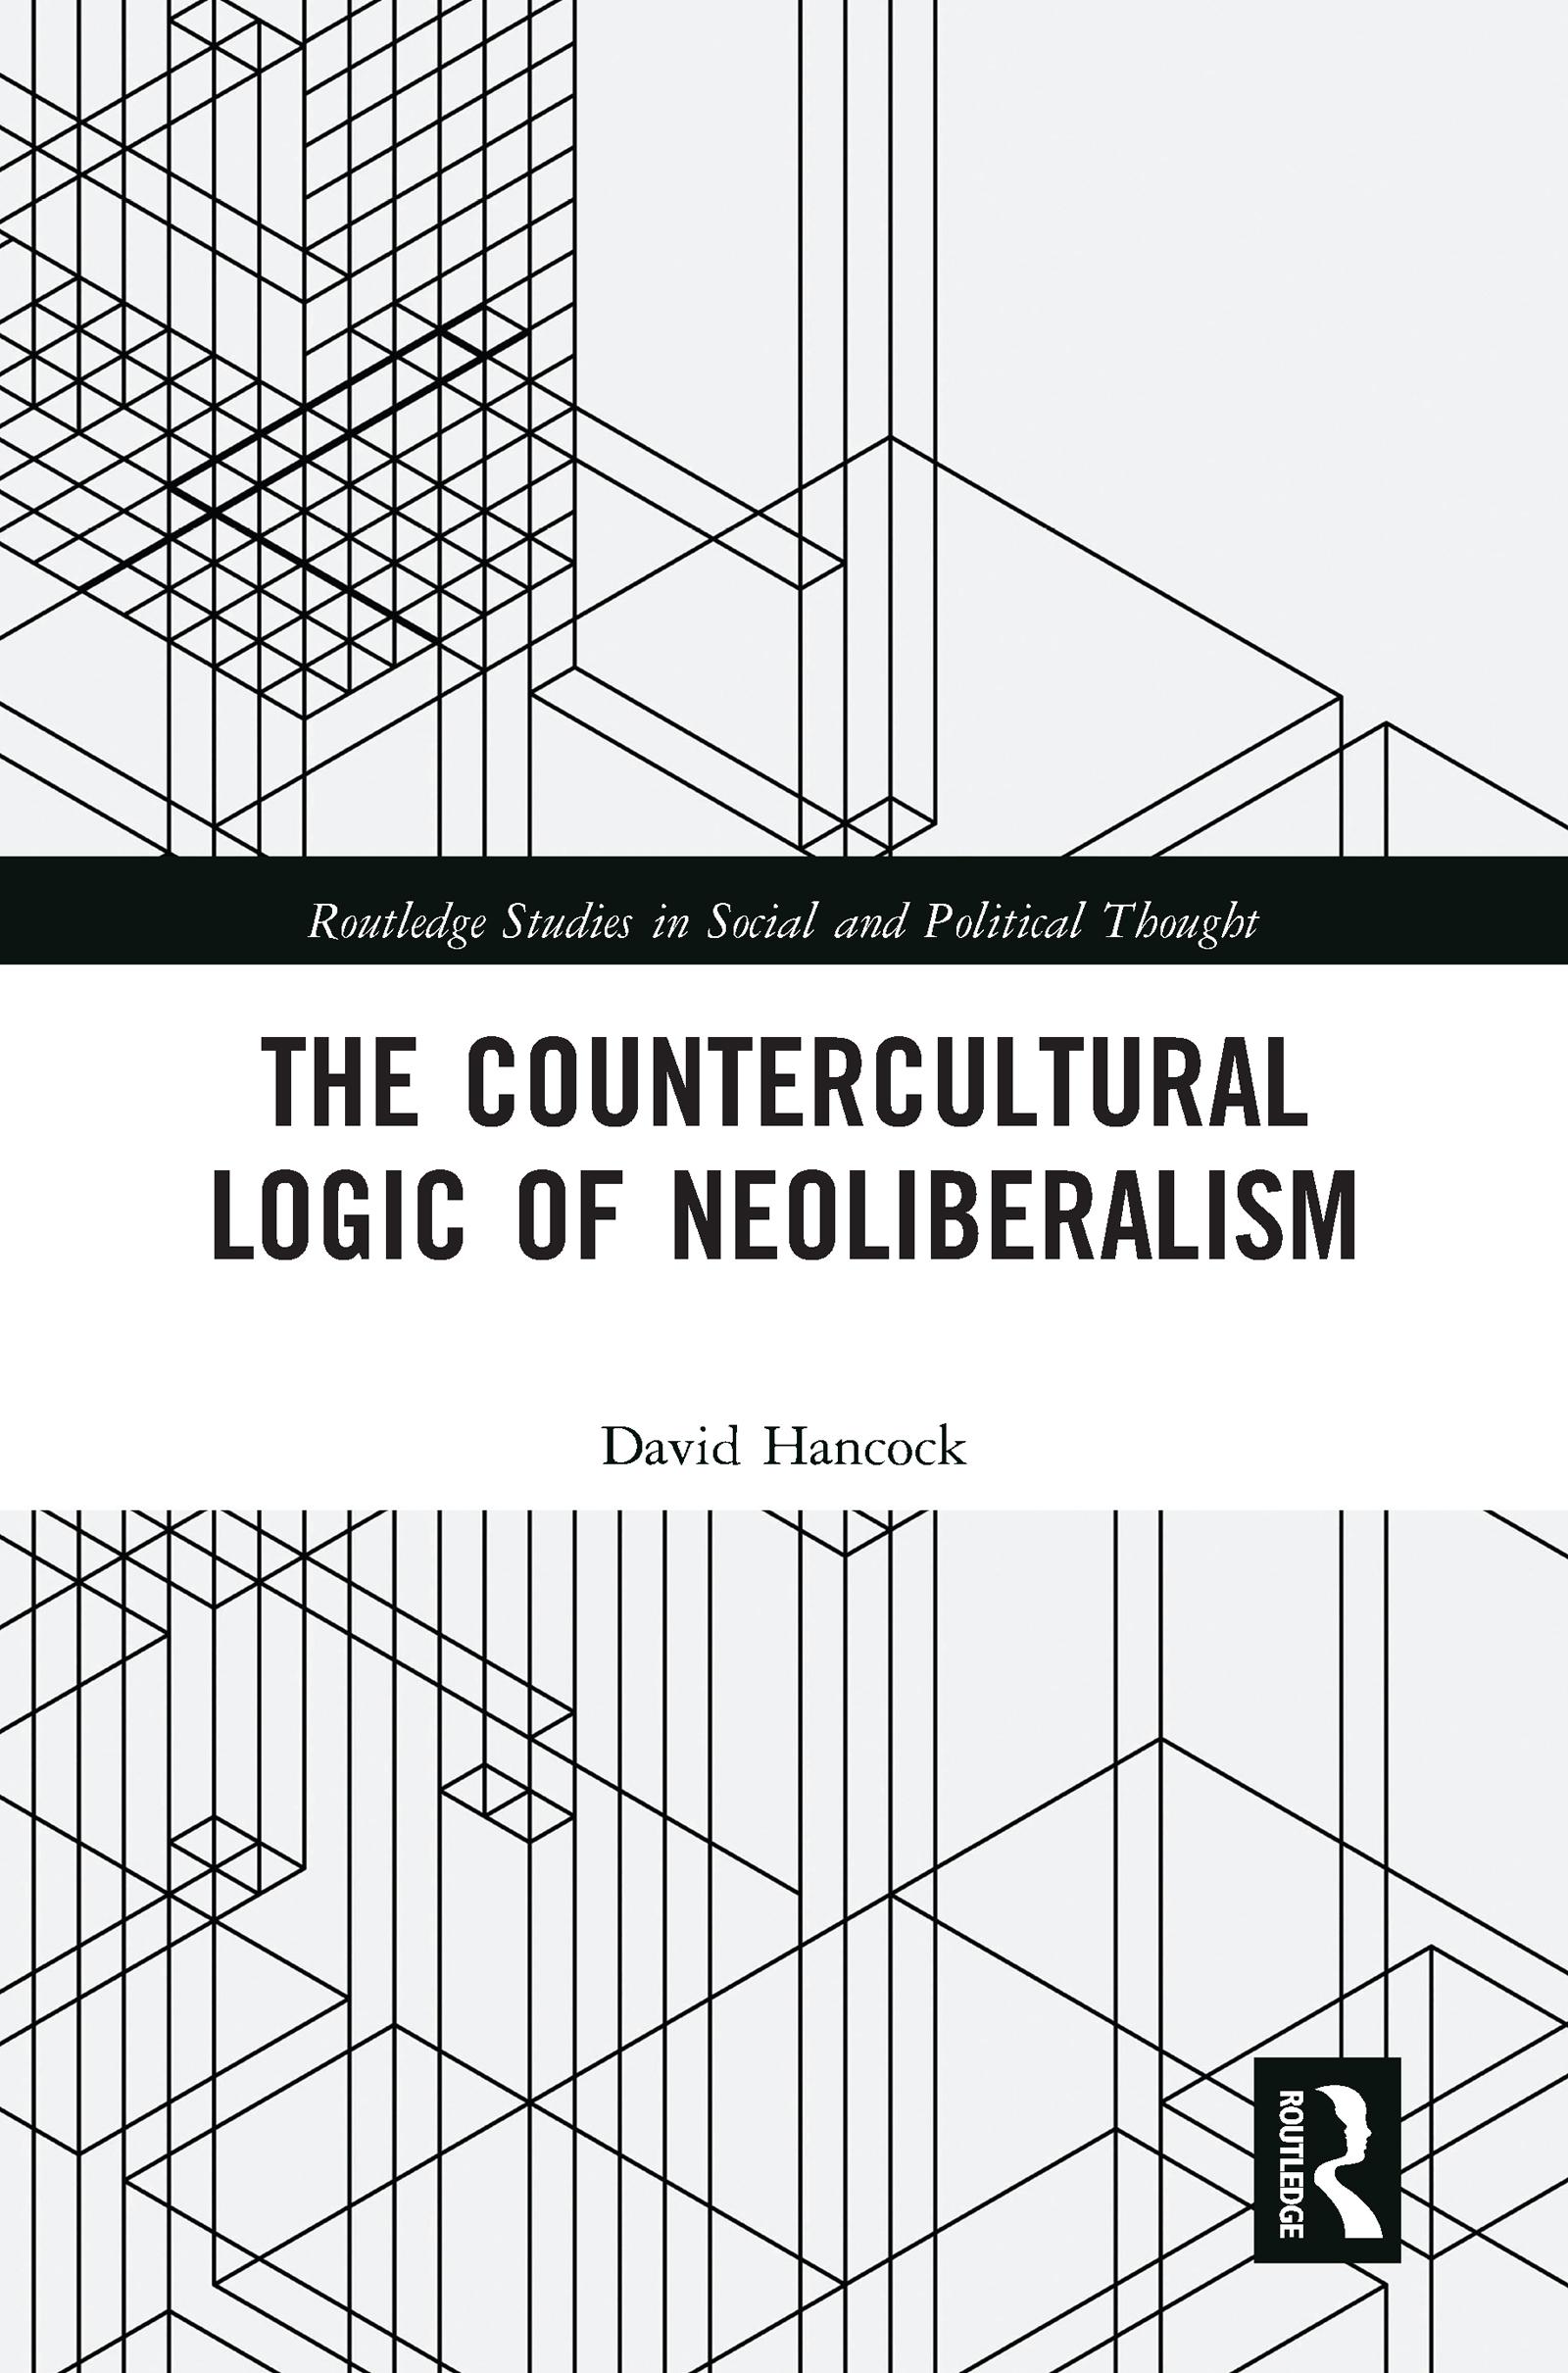 The Countercultural Logic of Neoliberalism